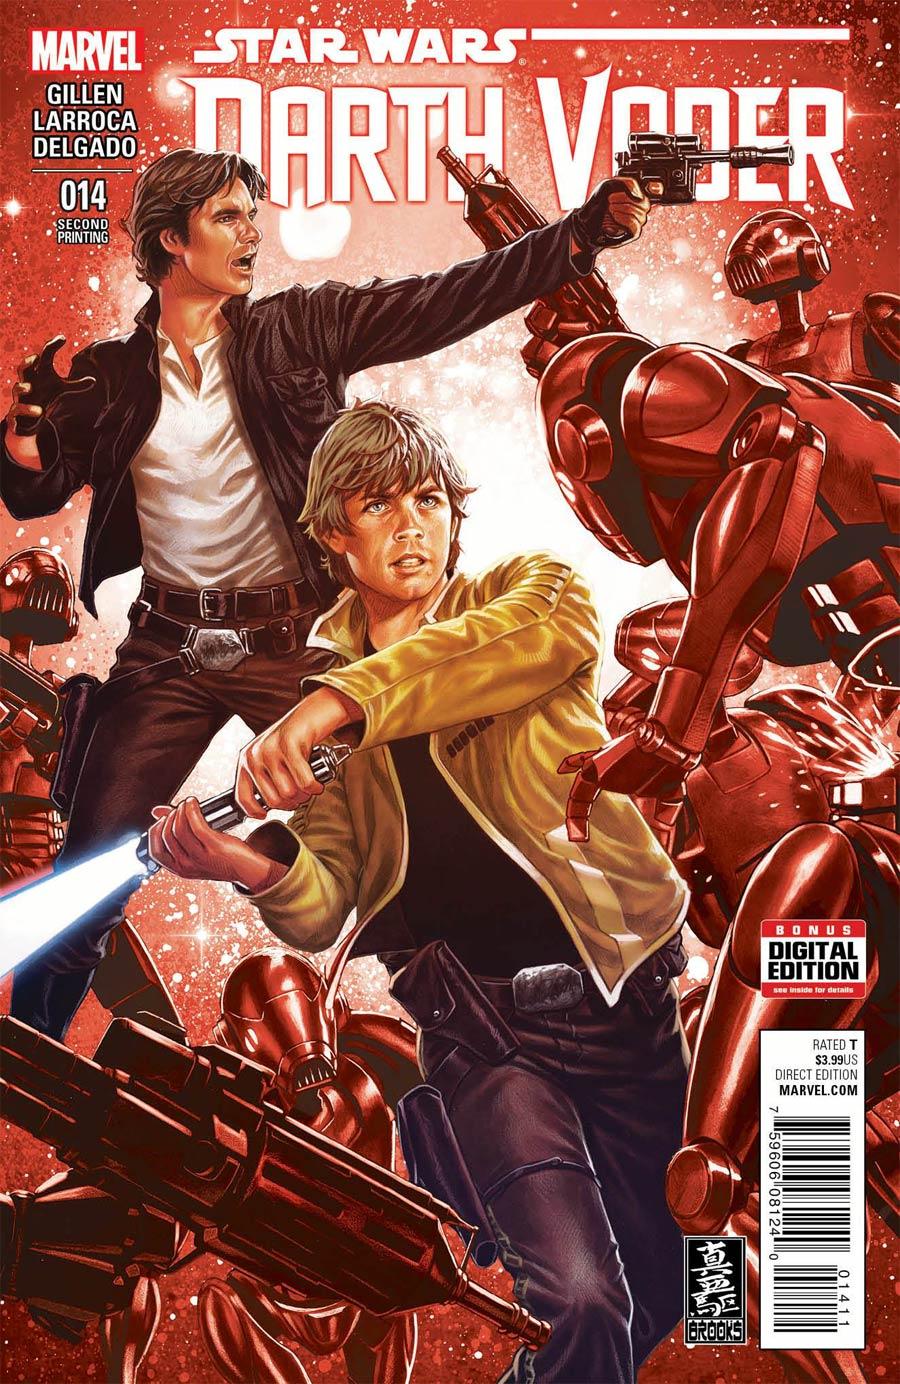 Darth Vader #14 Cover C 2nd Ptg Mark Brooks Variant Cover (Vader Down Part 4)